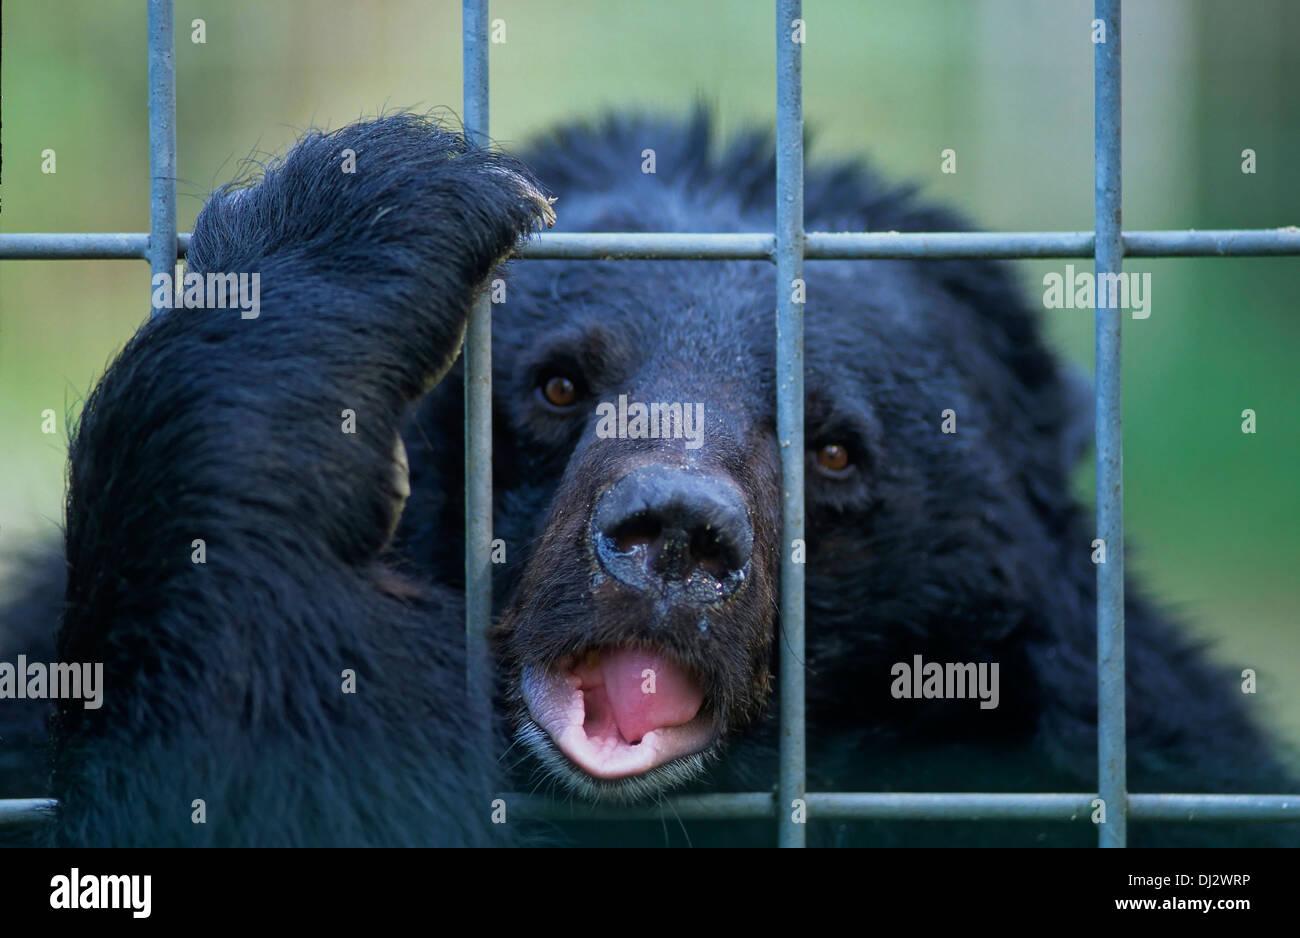 Asian black bear (Ursus thibetanus), moon bear, white-chested bear, Zoo: Kragenbär hinter Gitter, Kragenbär, Asiatischer Schwarz - Stock Image